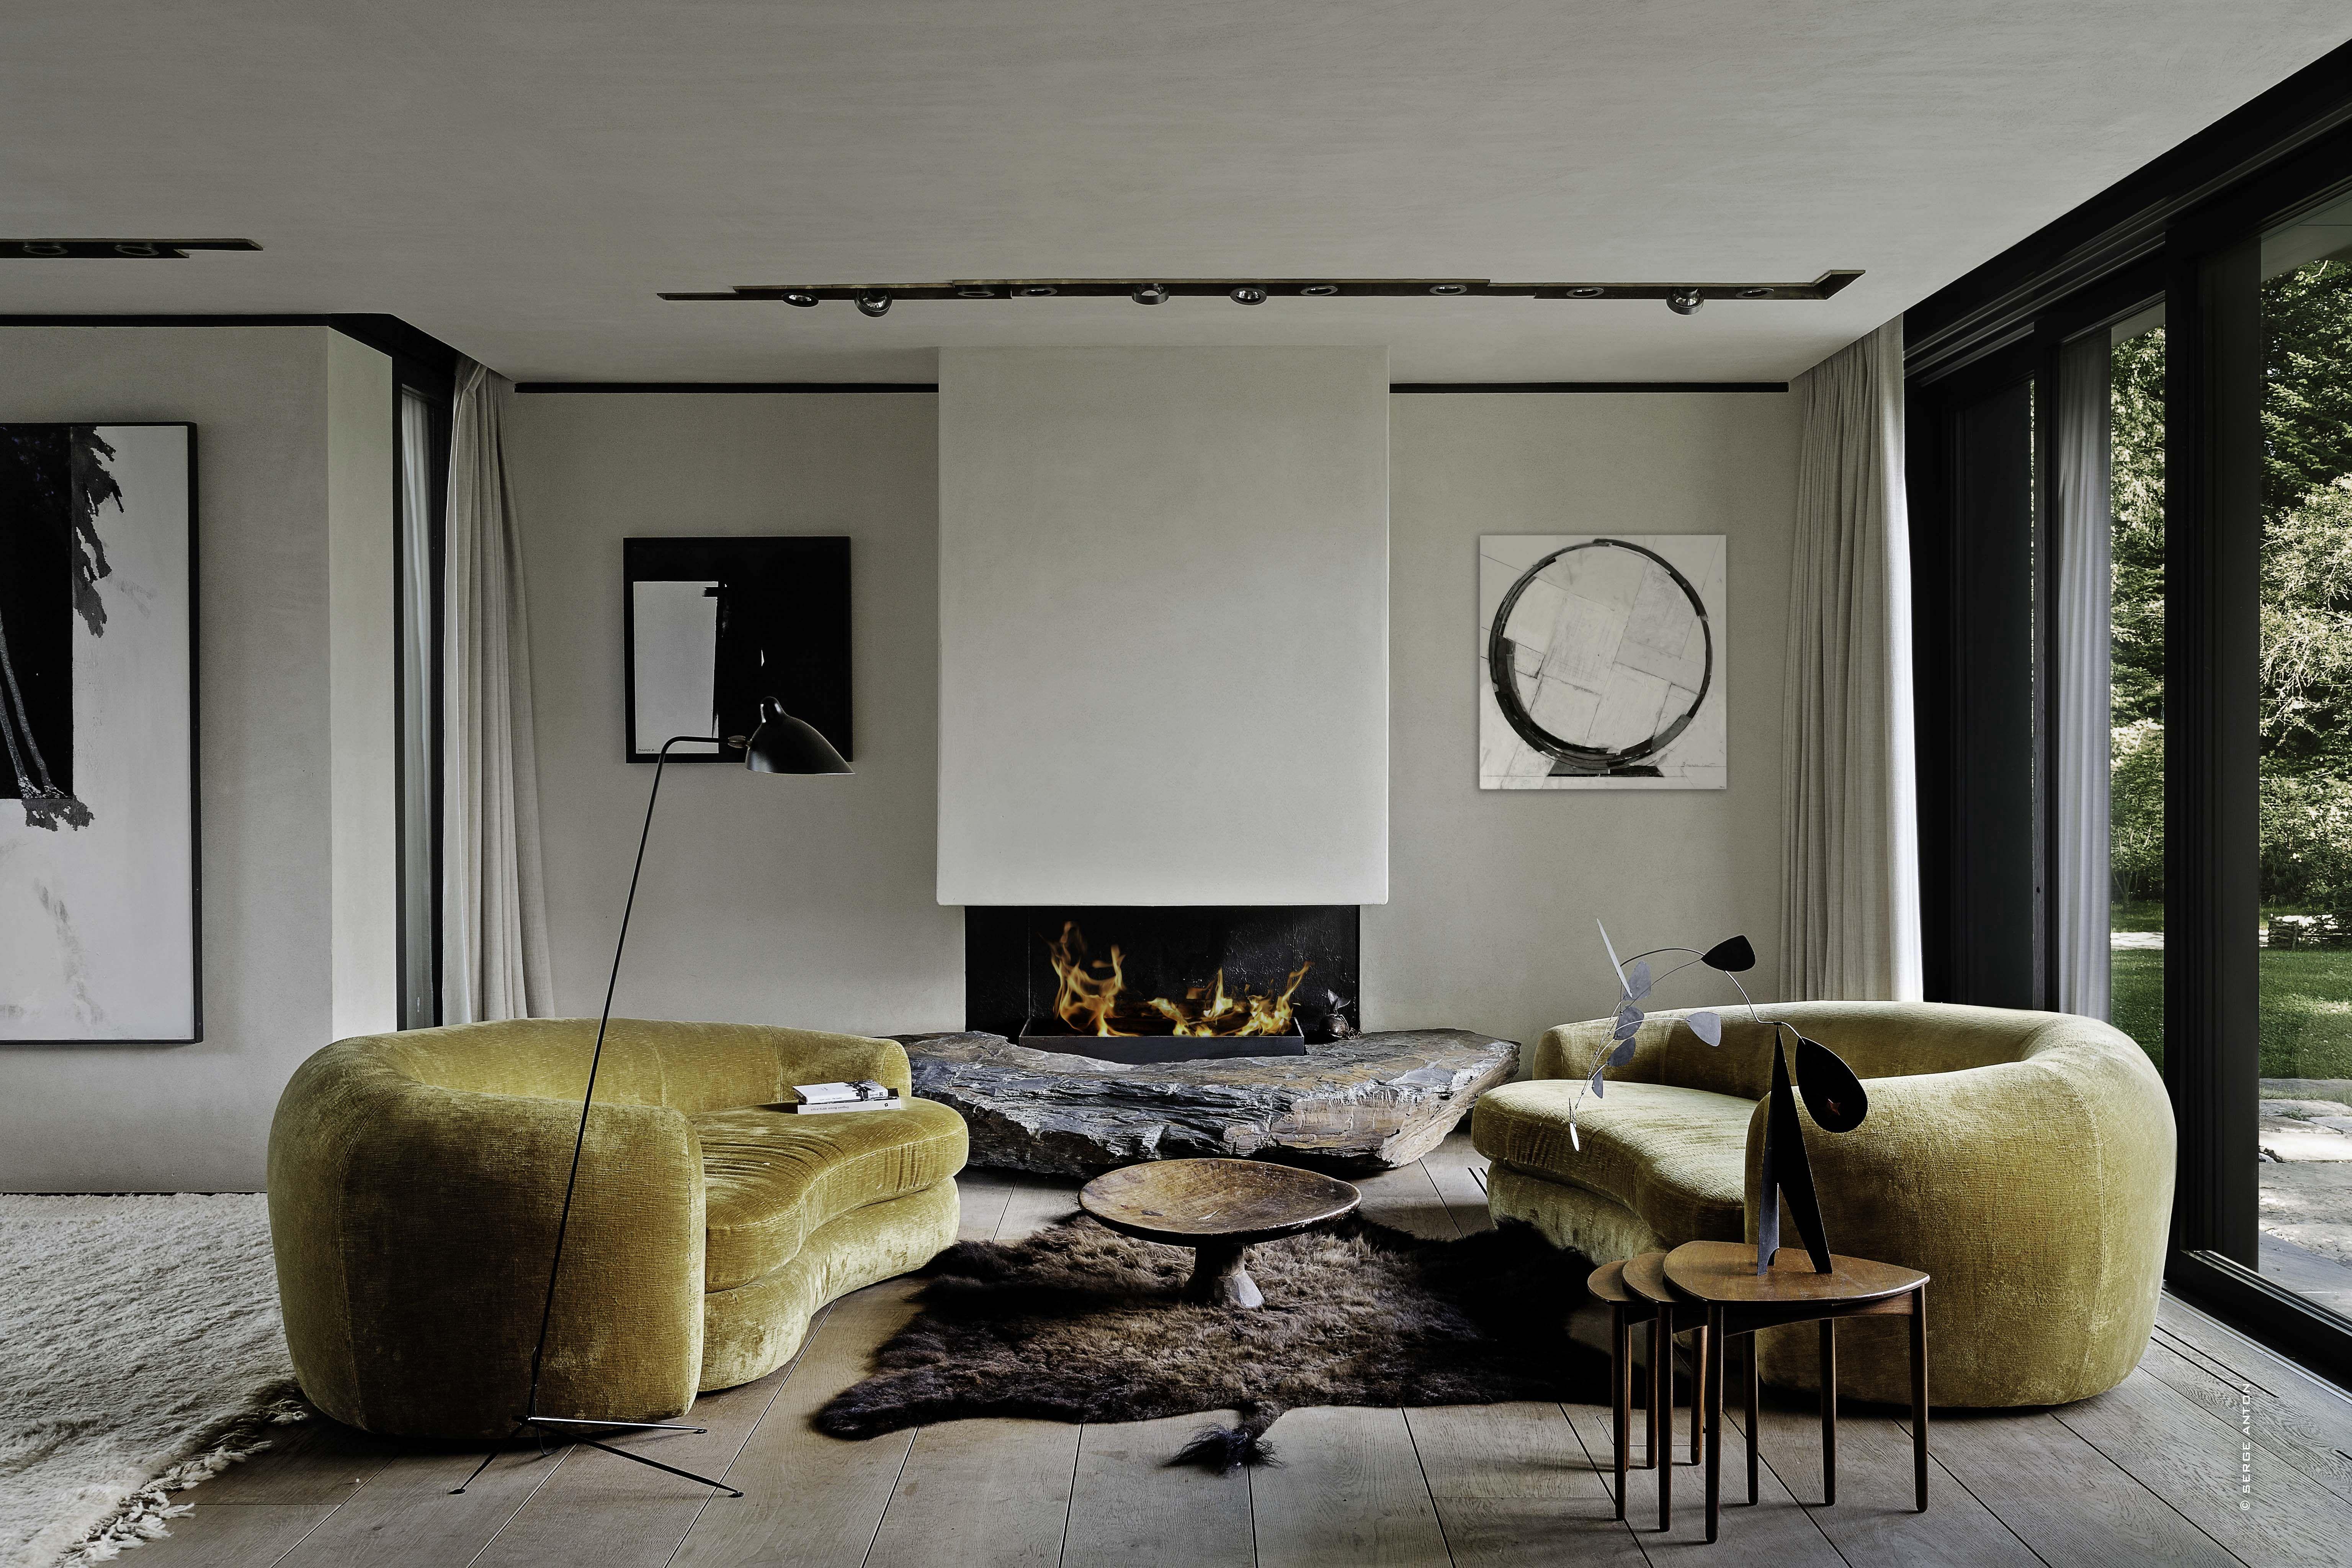 Luxury Living Room With Bespoke Sofas Pic: Serge Anton #bespoke #livingroom  #luxury #designer #interiordesign #interiors